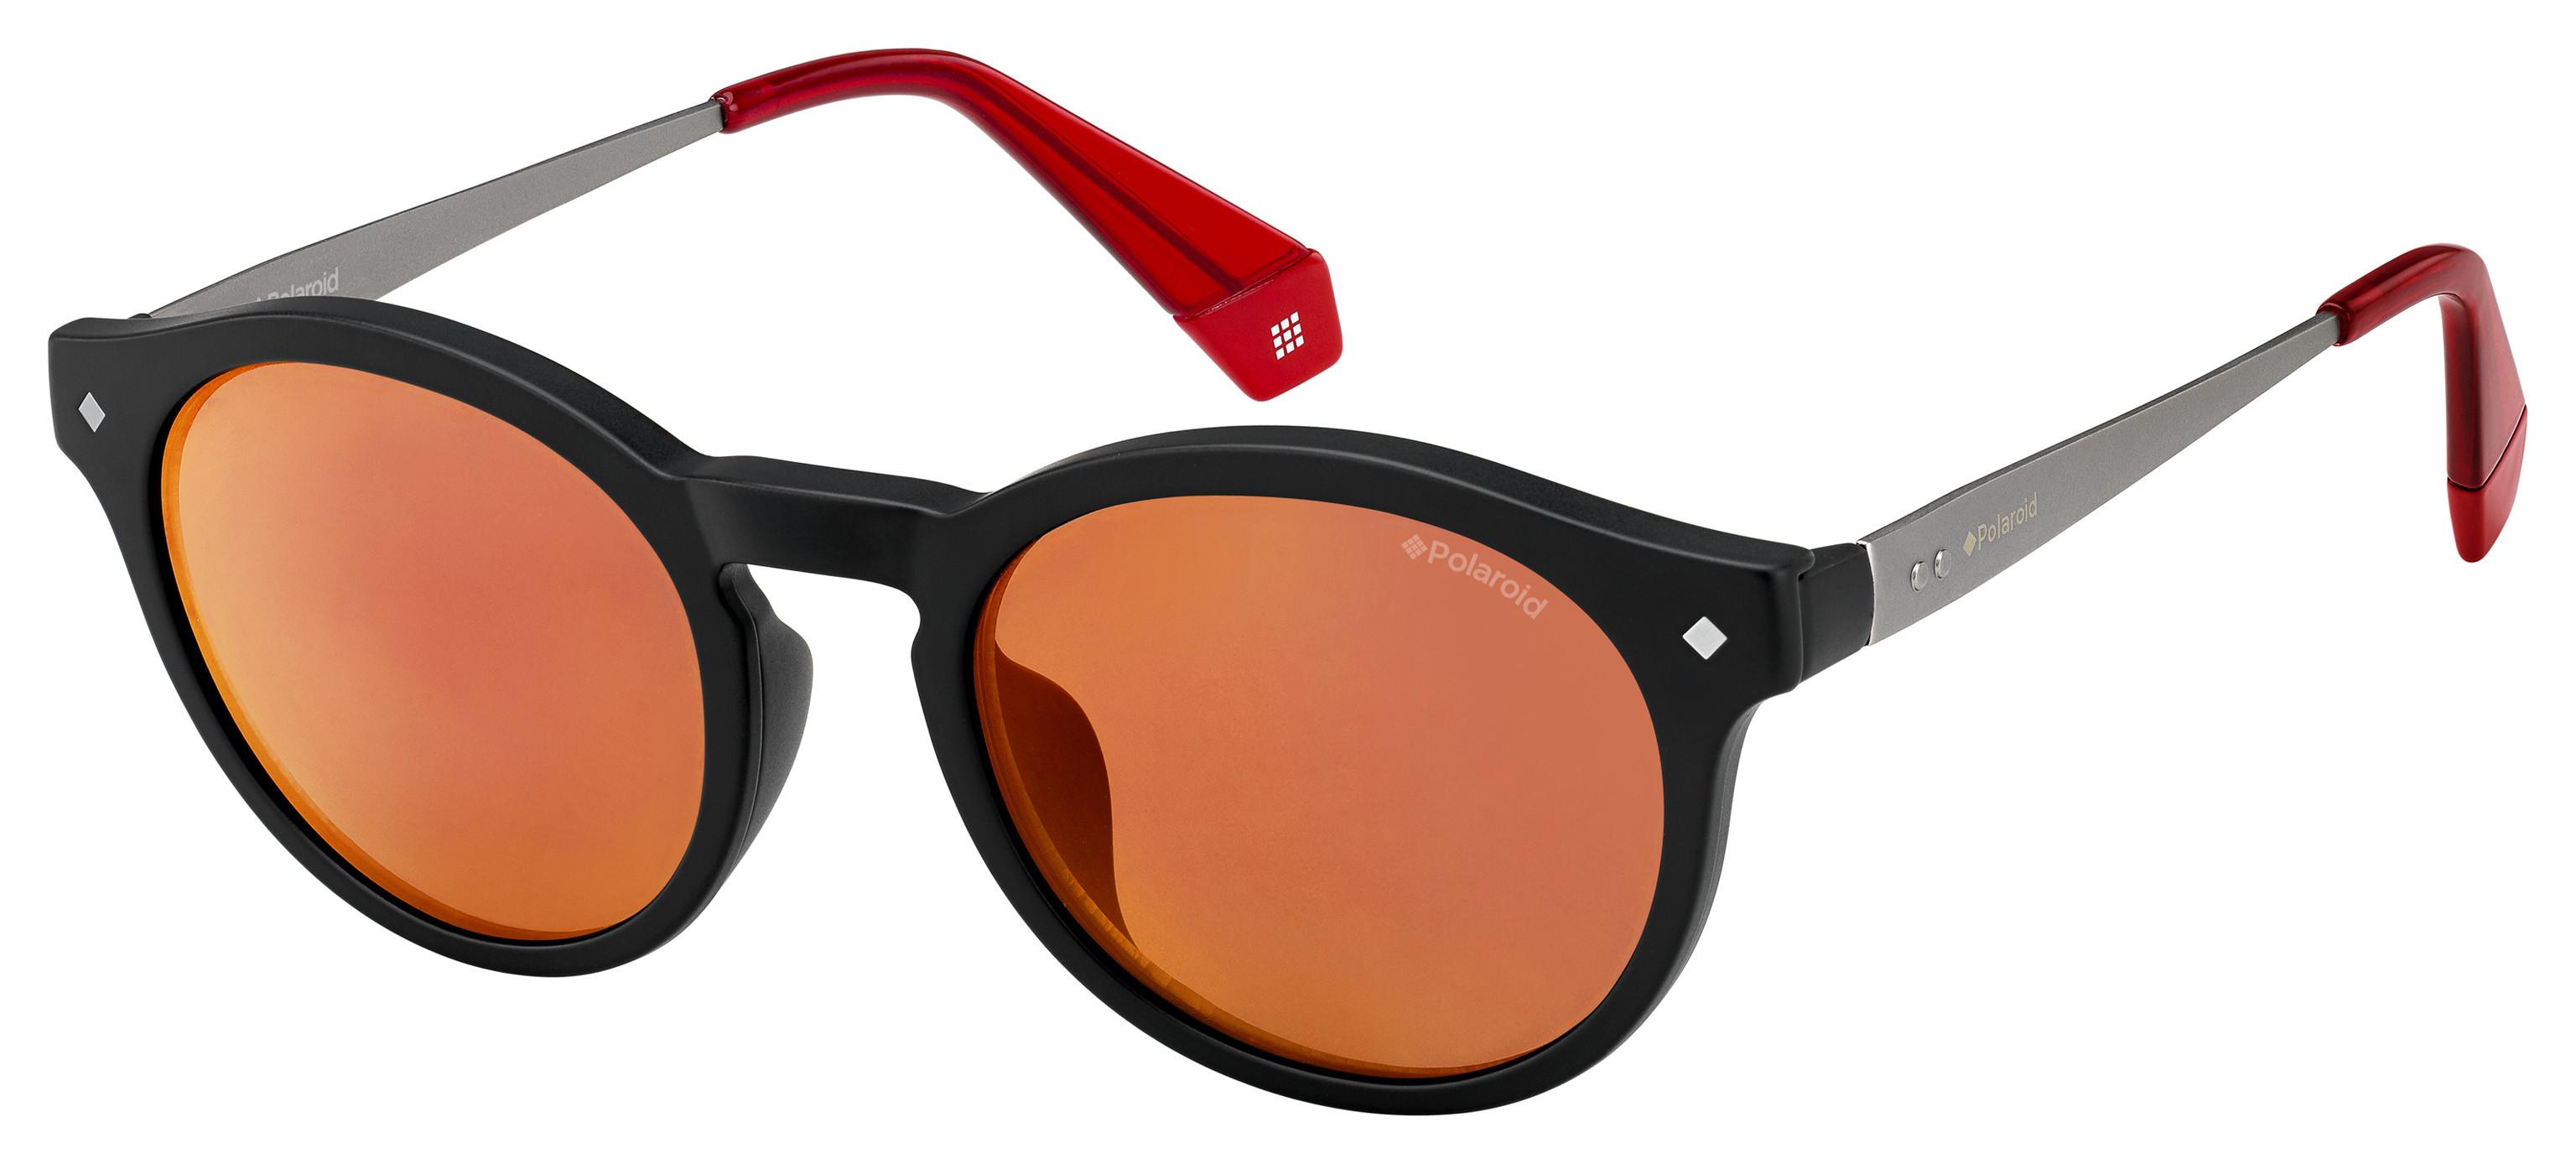 Gafas de sol POLAROID PLD 6081 CS OIT OZ